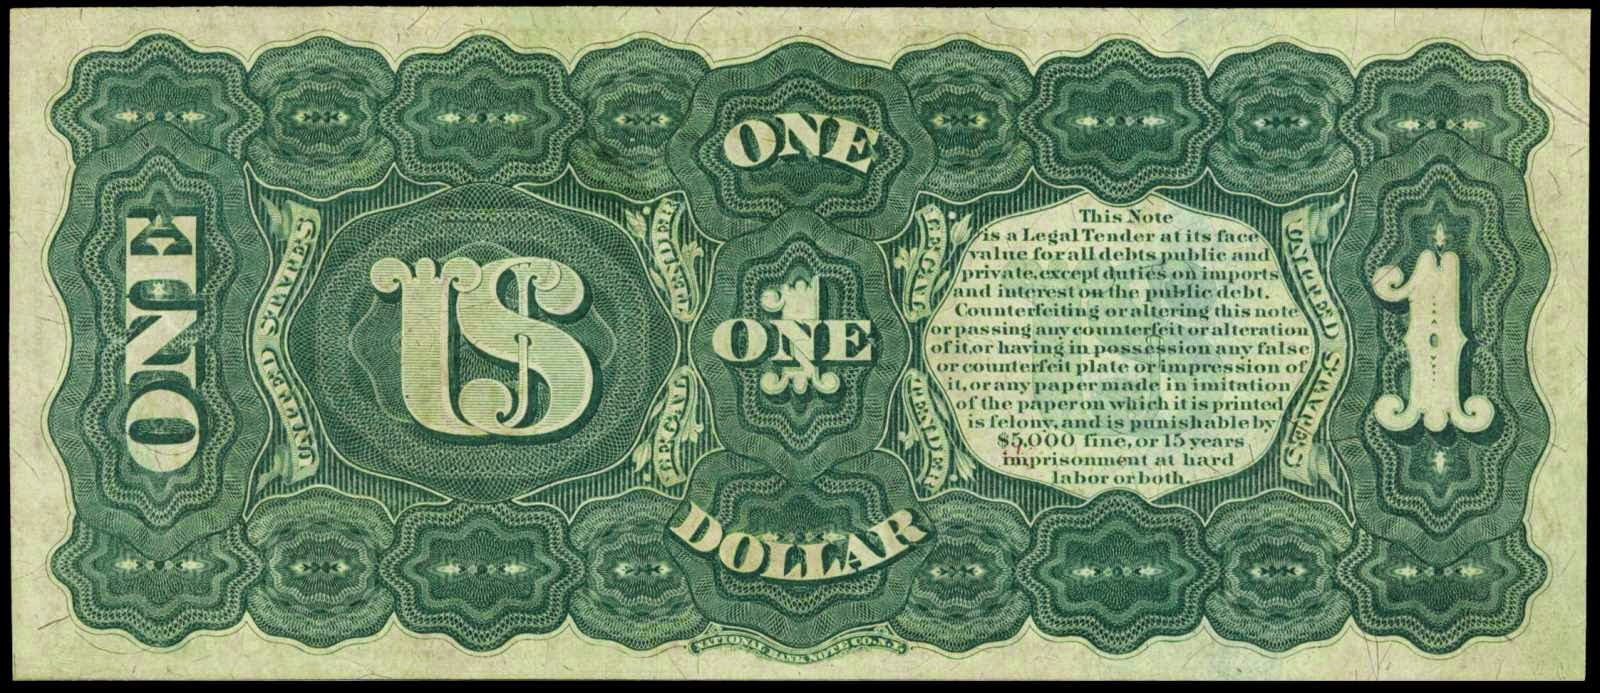 1869 One Dollar Legal Tender Rainbow Notes World